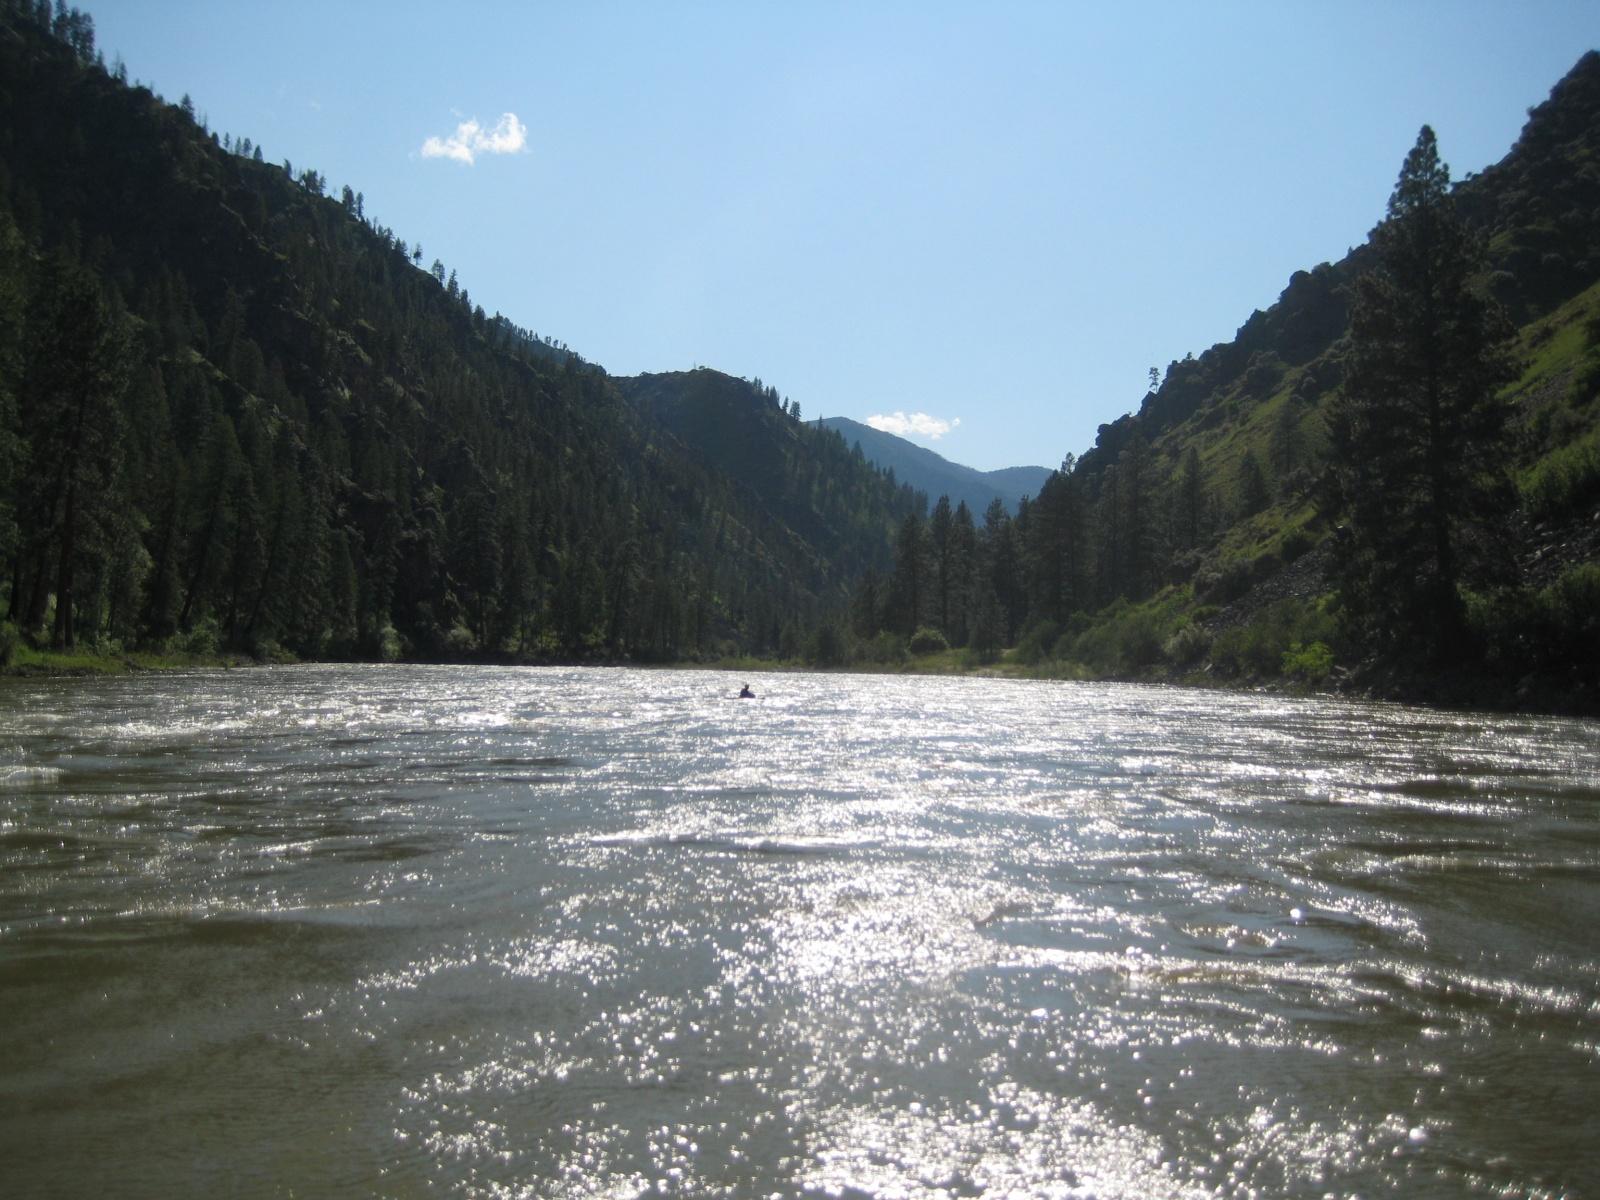 Click image for larger version  Name:2009 kayaking 425.jpg Views:169 Size:621.5 KB ID:2556